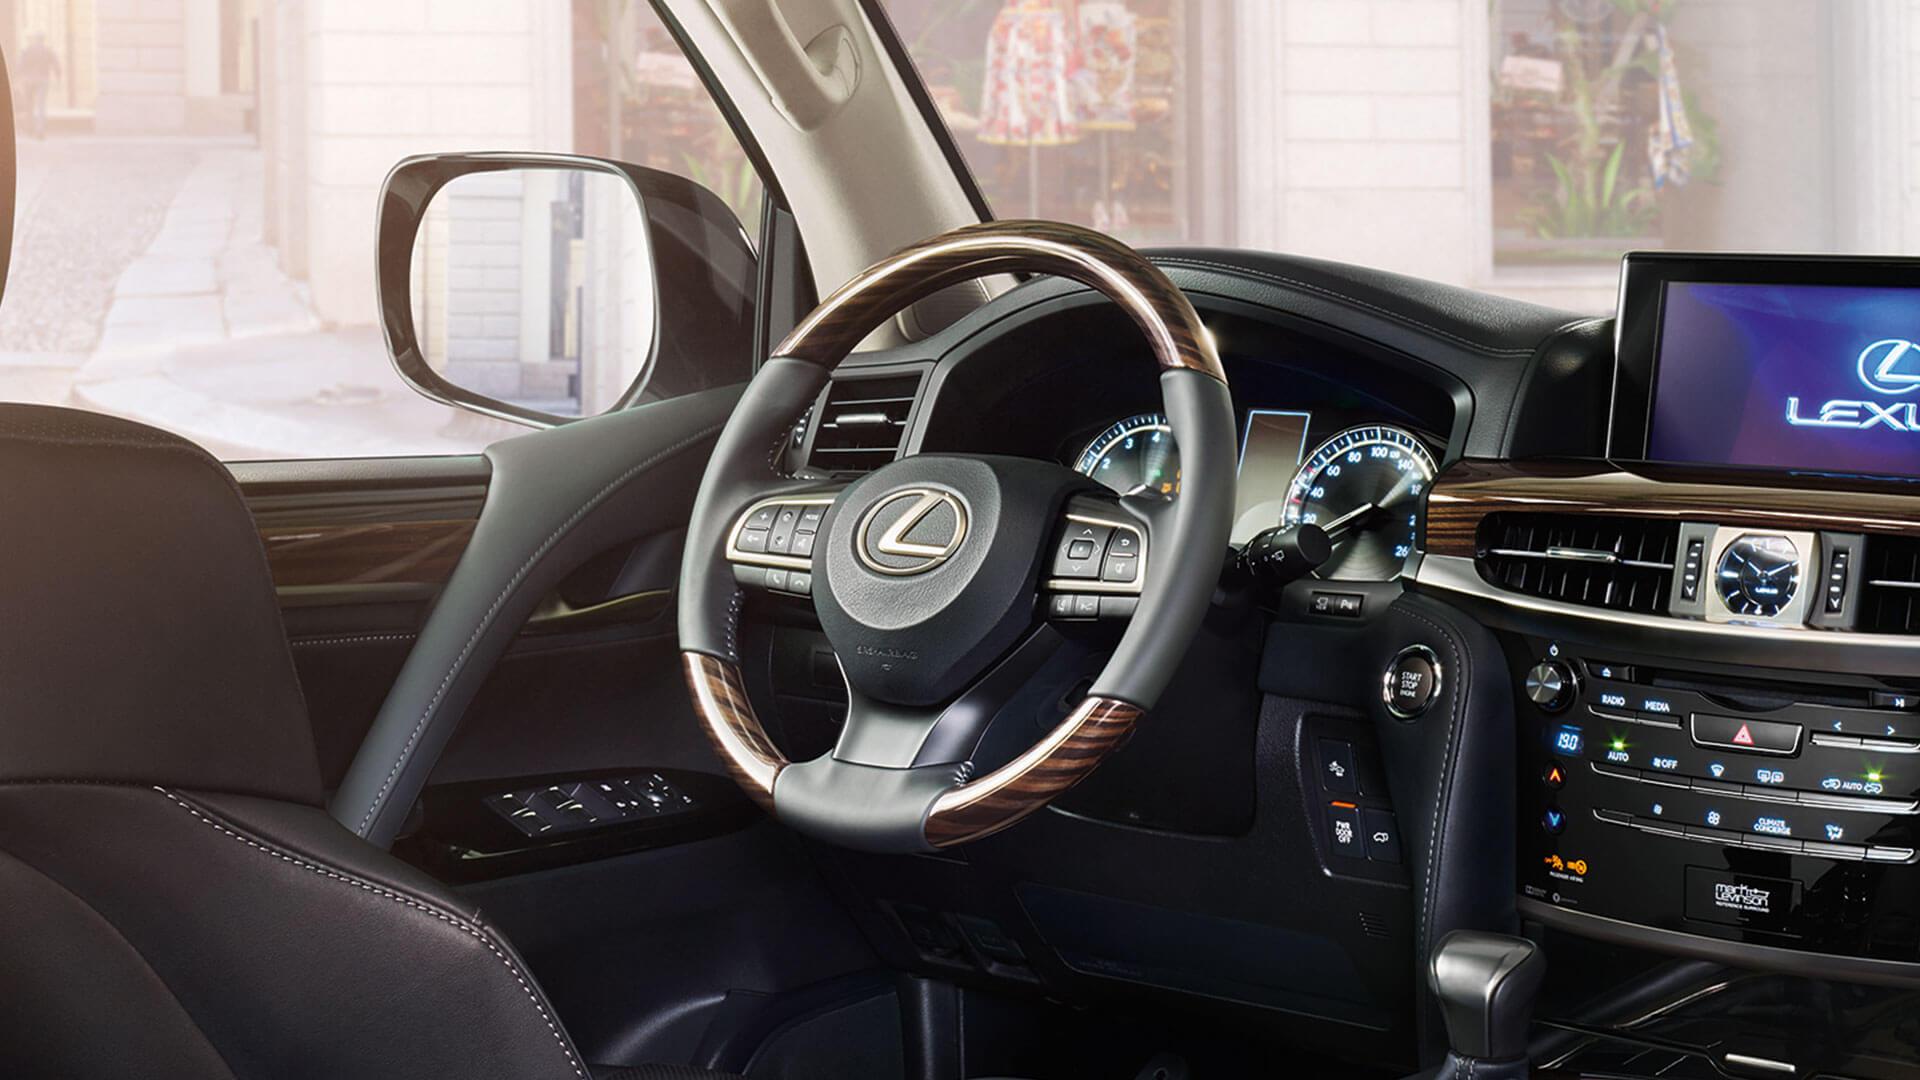 2017 lexus lx 570 features stearing wheel